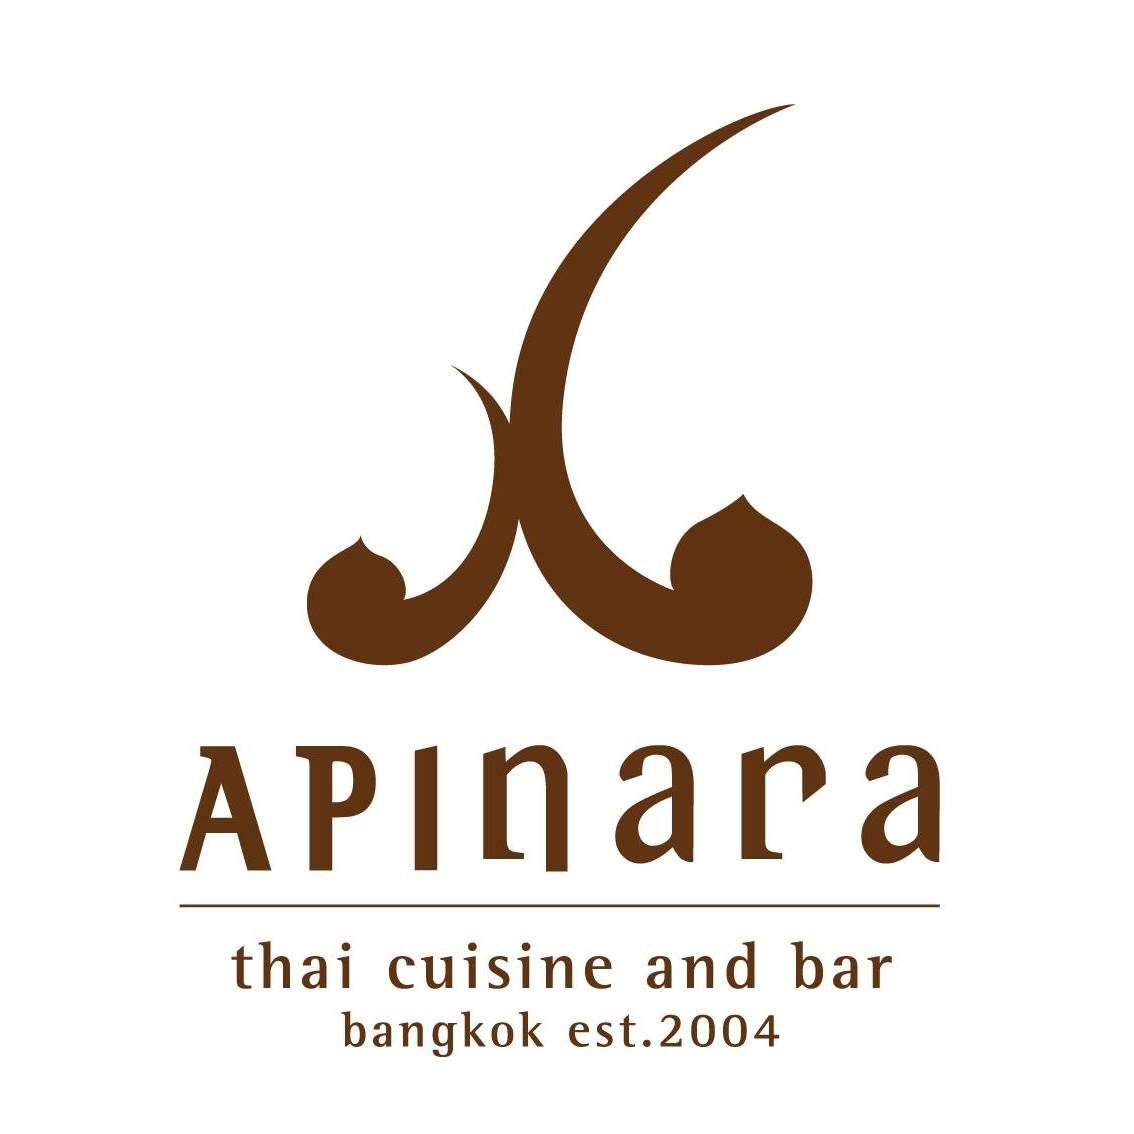 Apinara